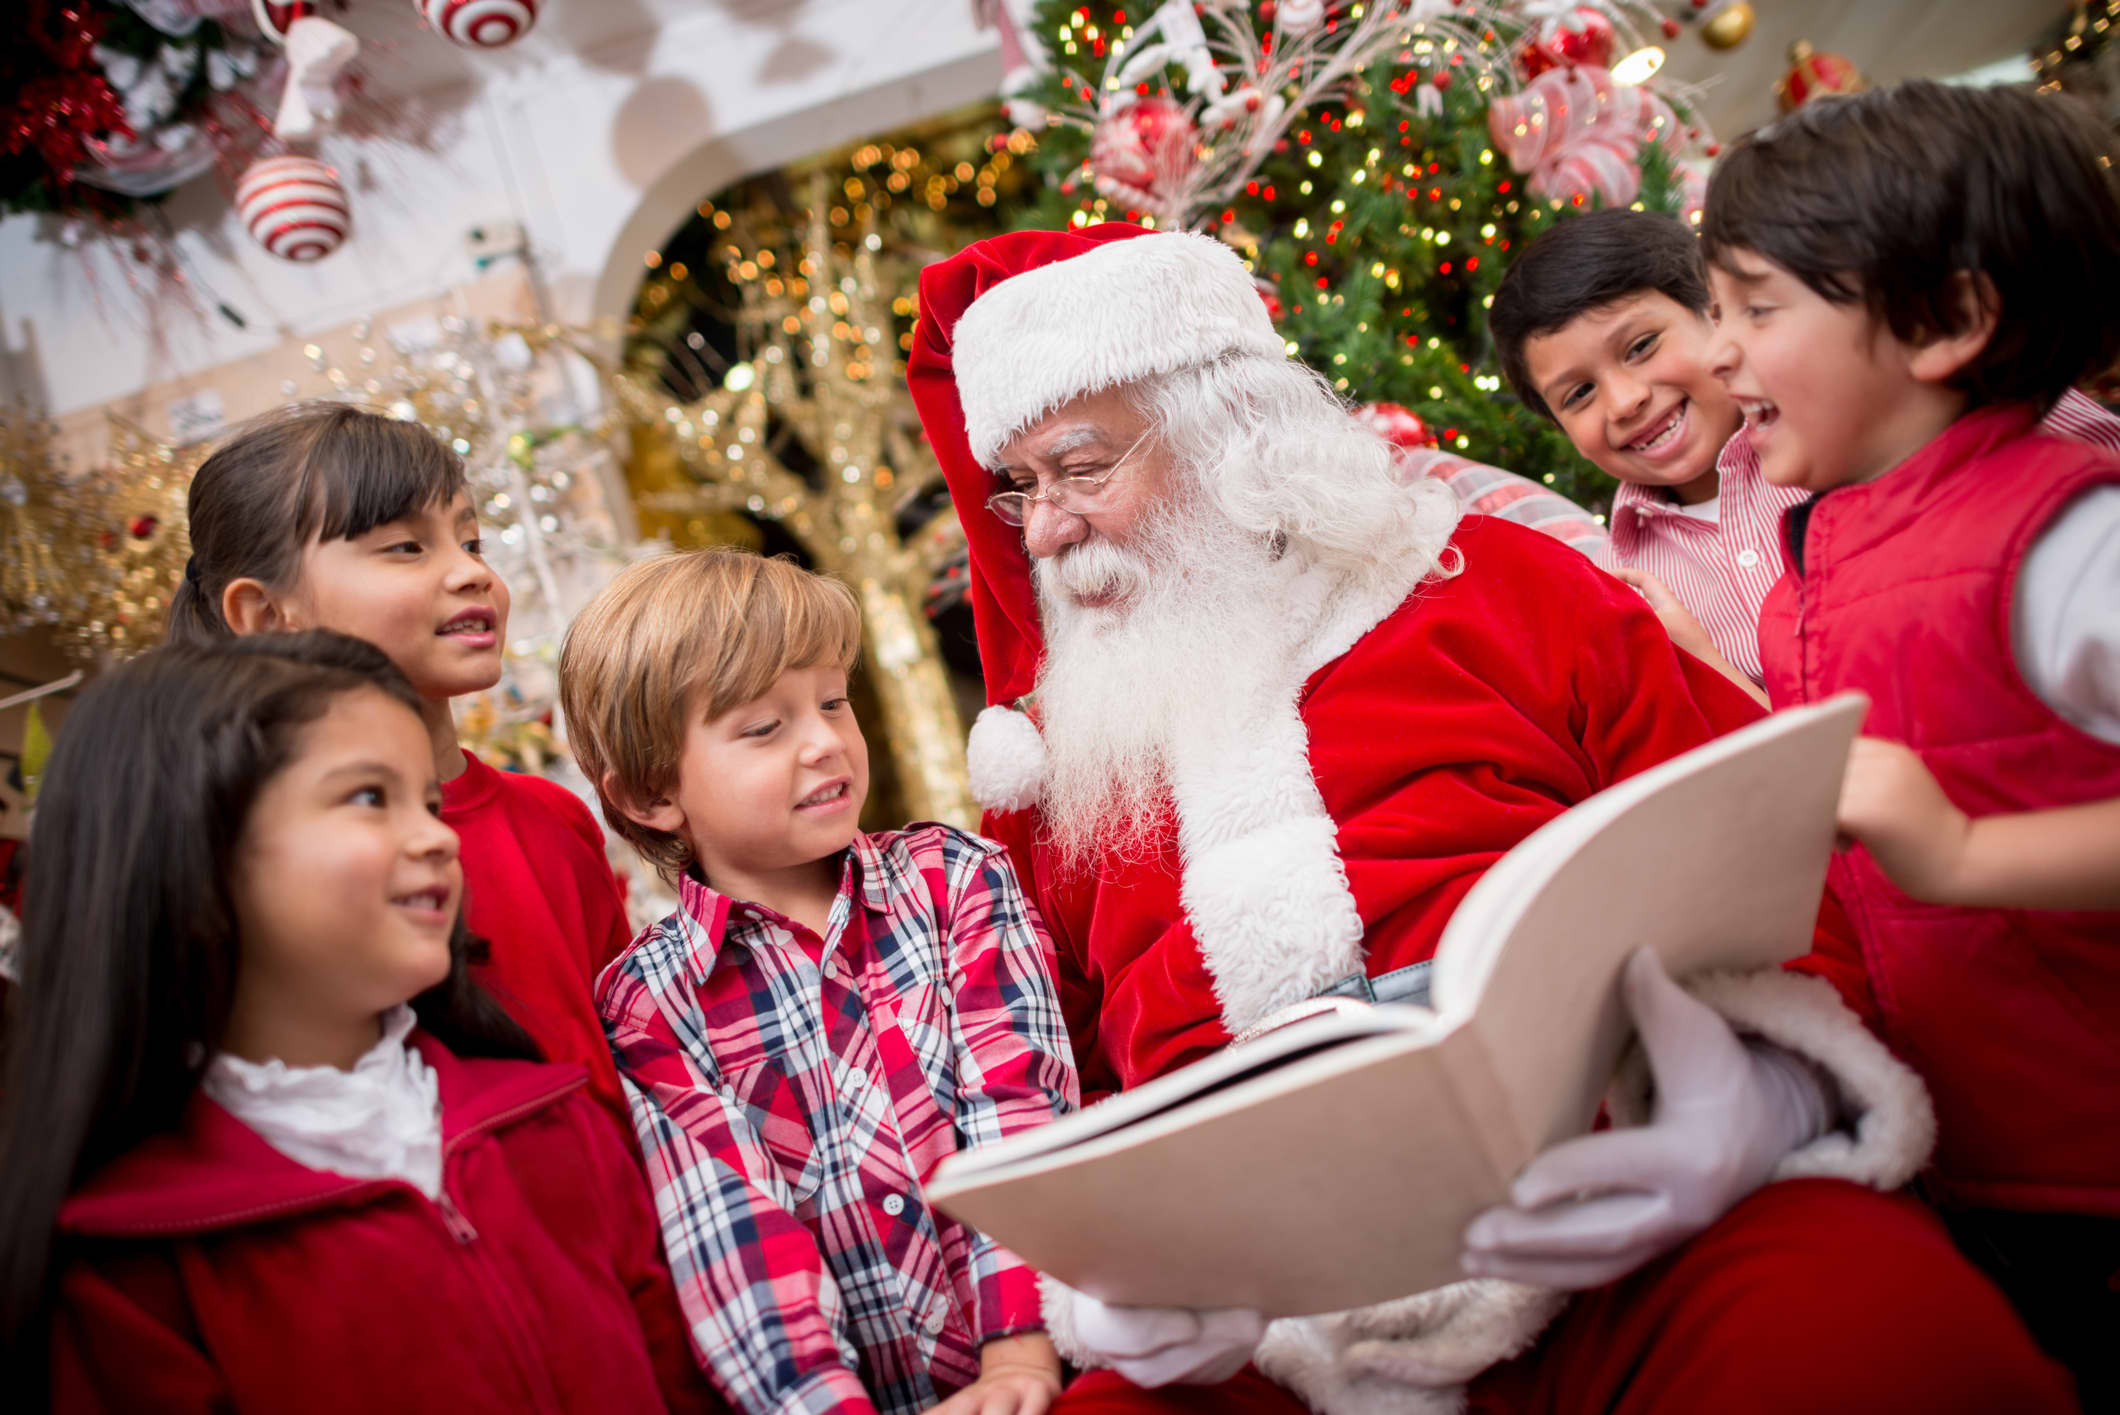 Santa's pay takes a hit this year